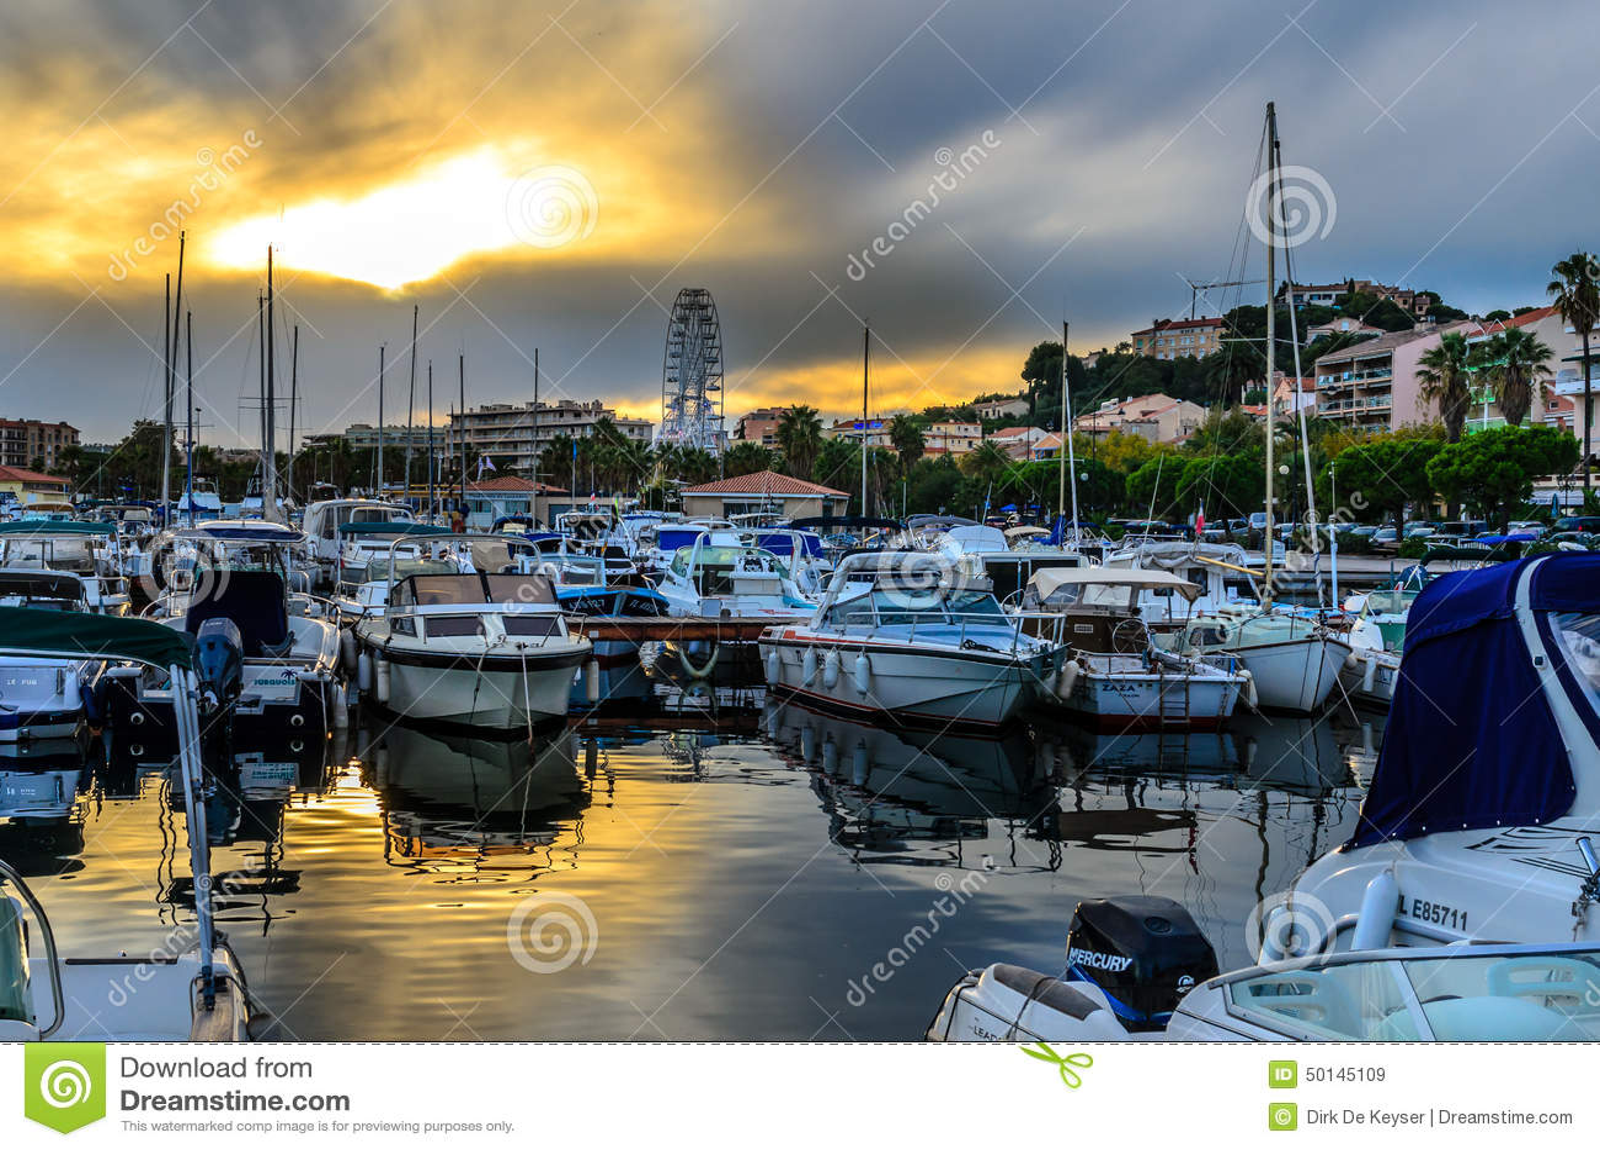 Lavandou international marina in the french Riviera